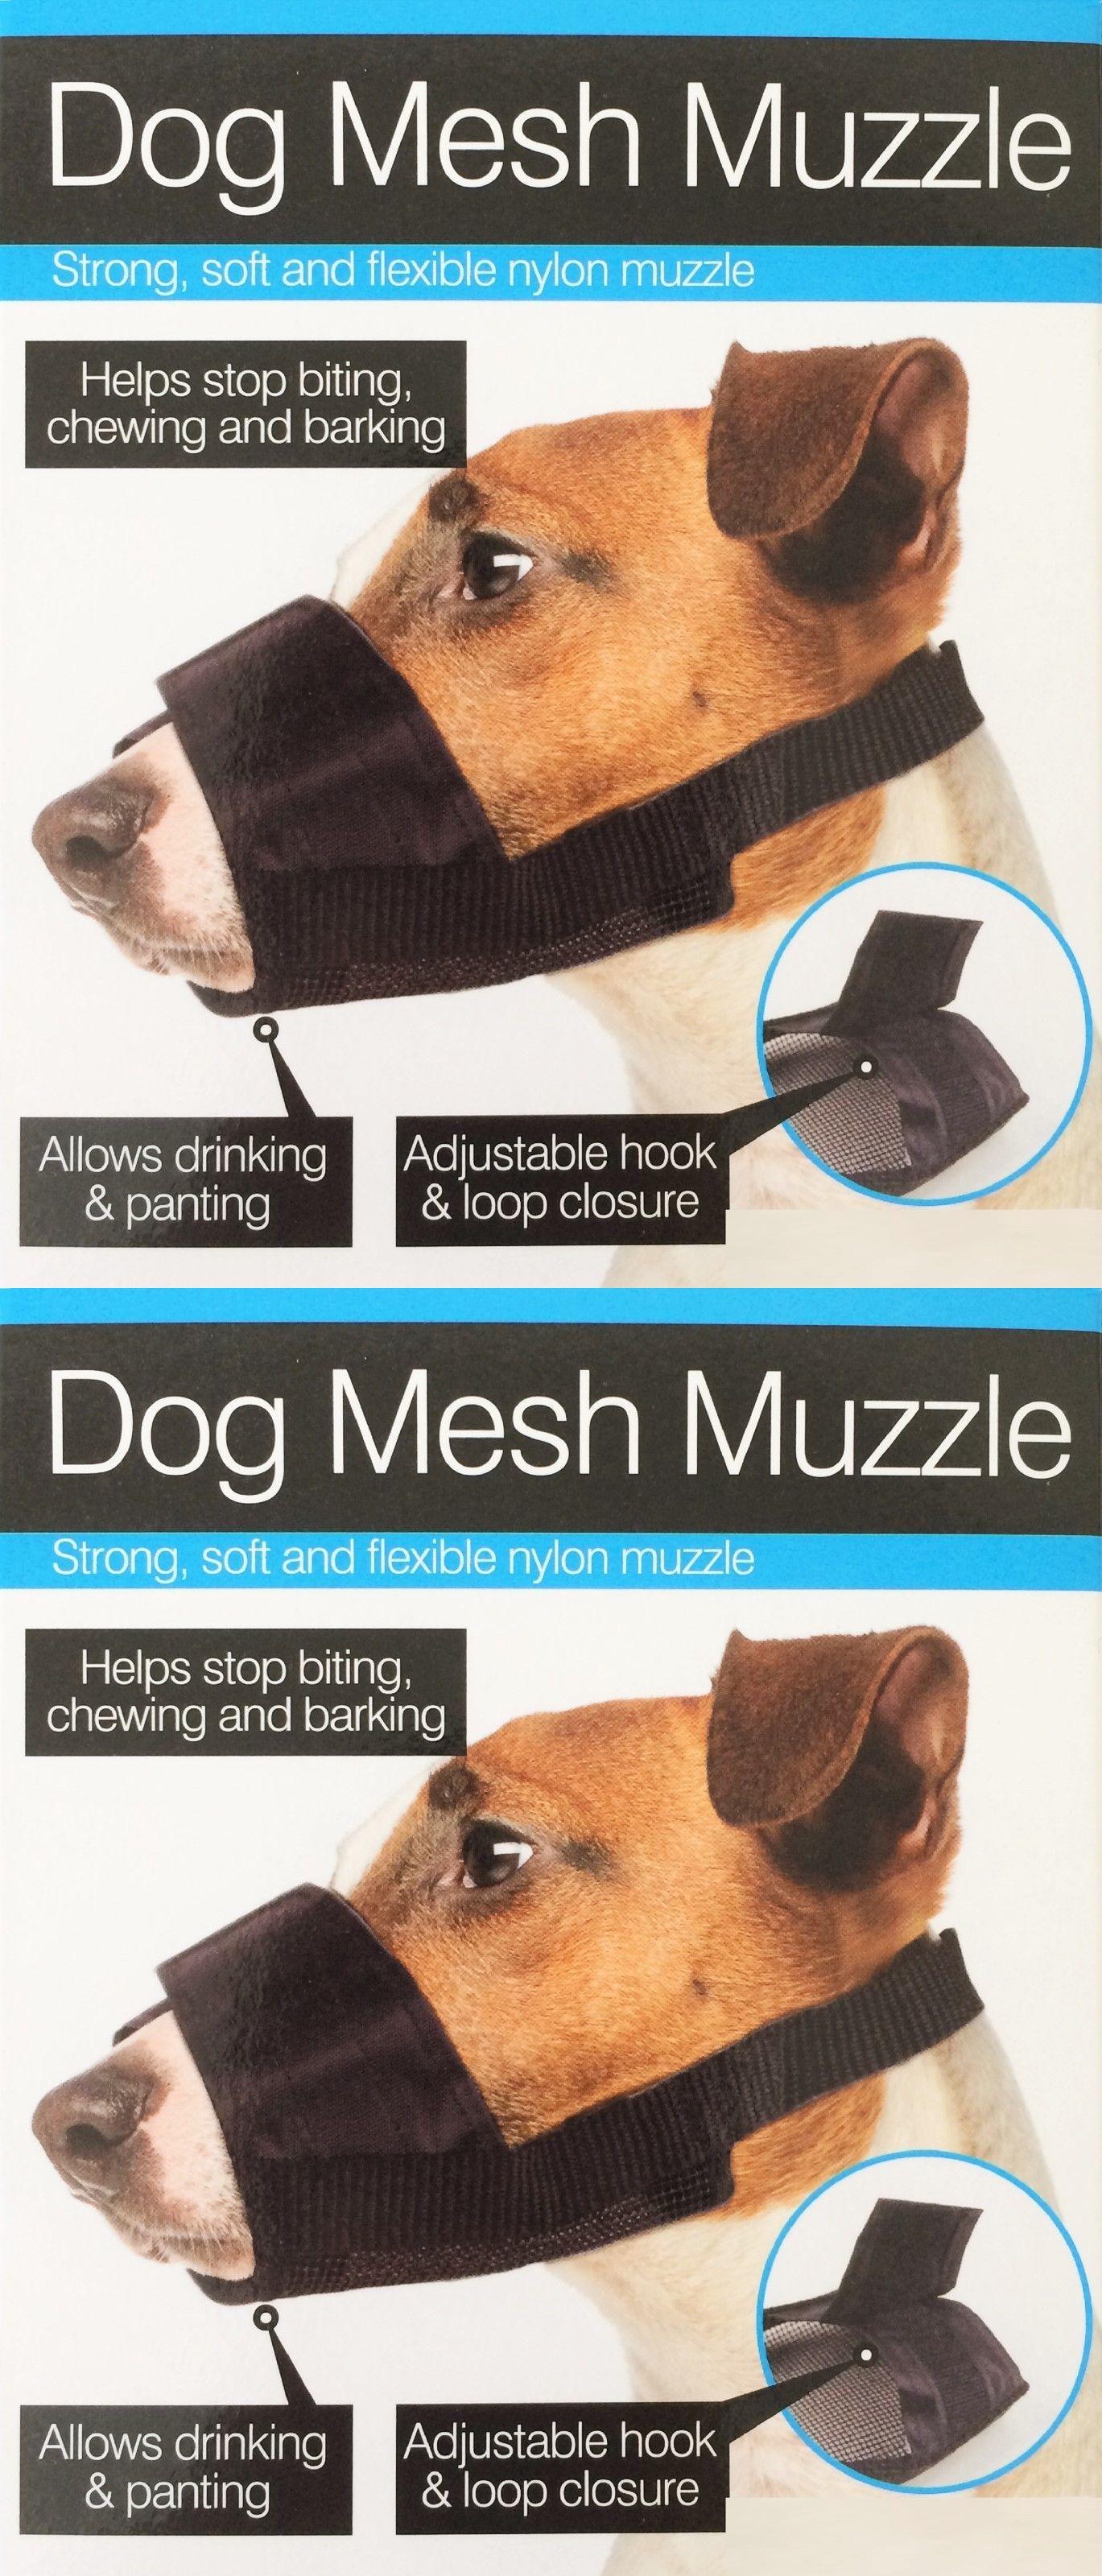 239c1ce0cadcf917cf5572d00fadb537 - How To Get A Dog To Stop Aggressive Biting